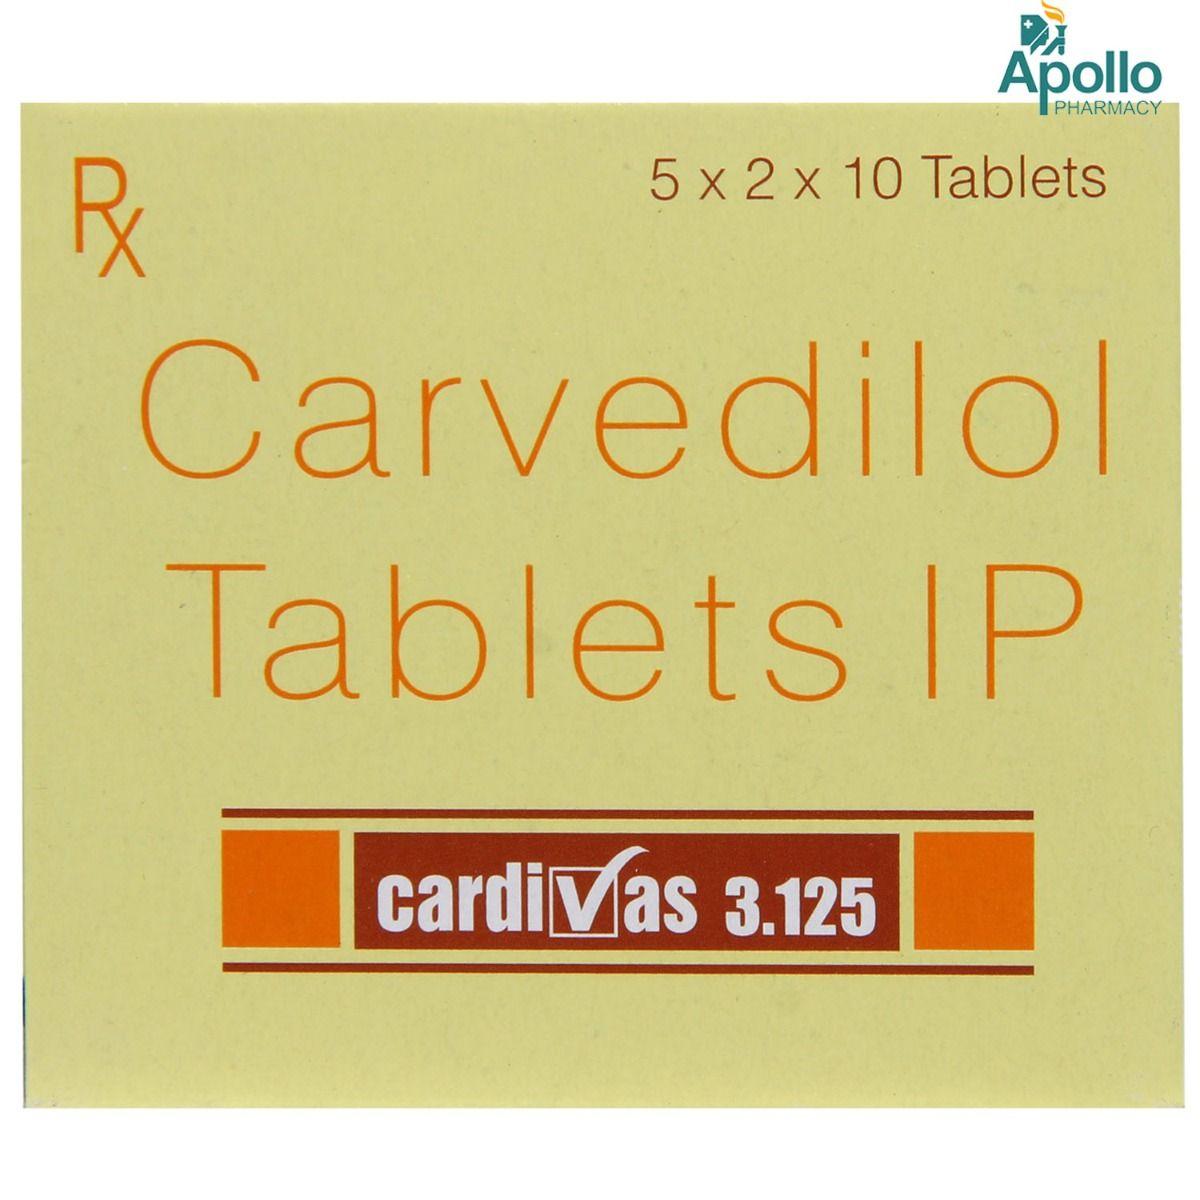 Cardivas 3.125mg Tablet 10's